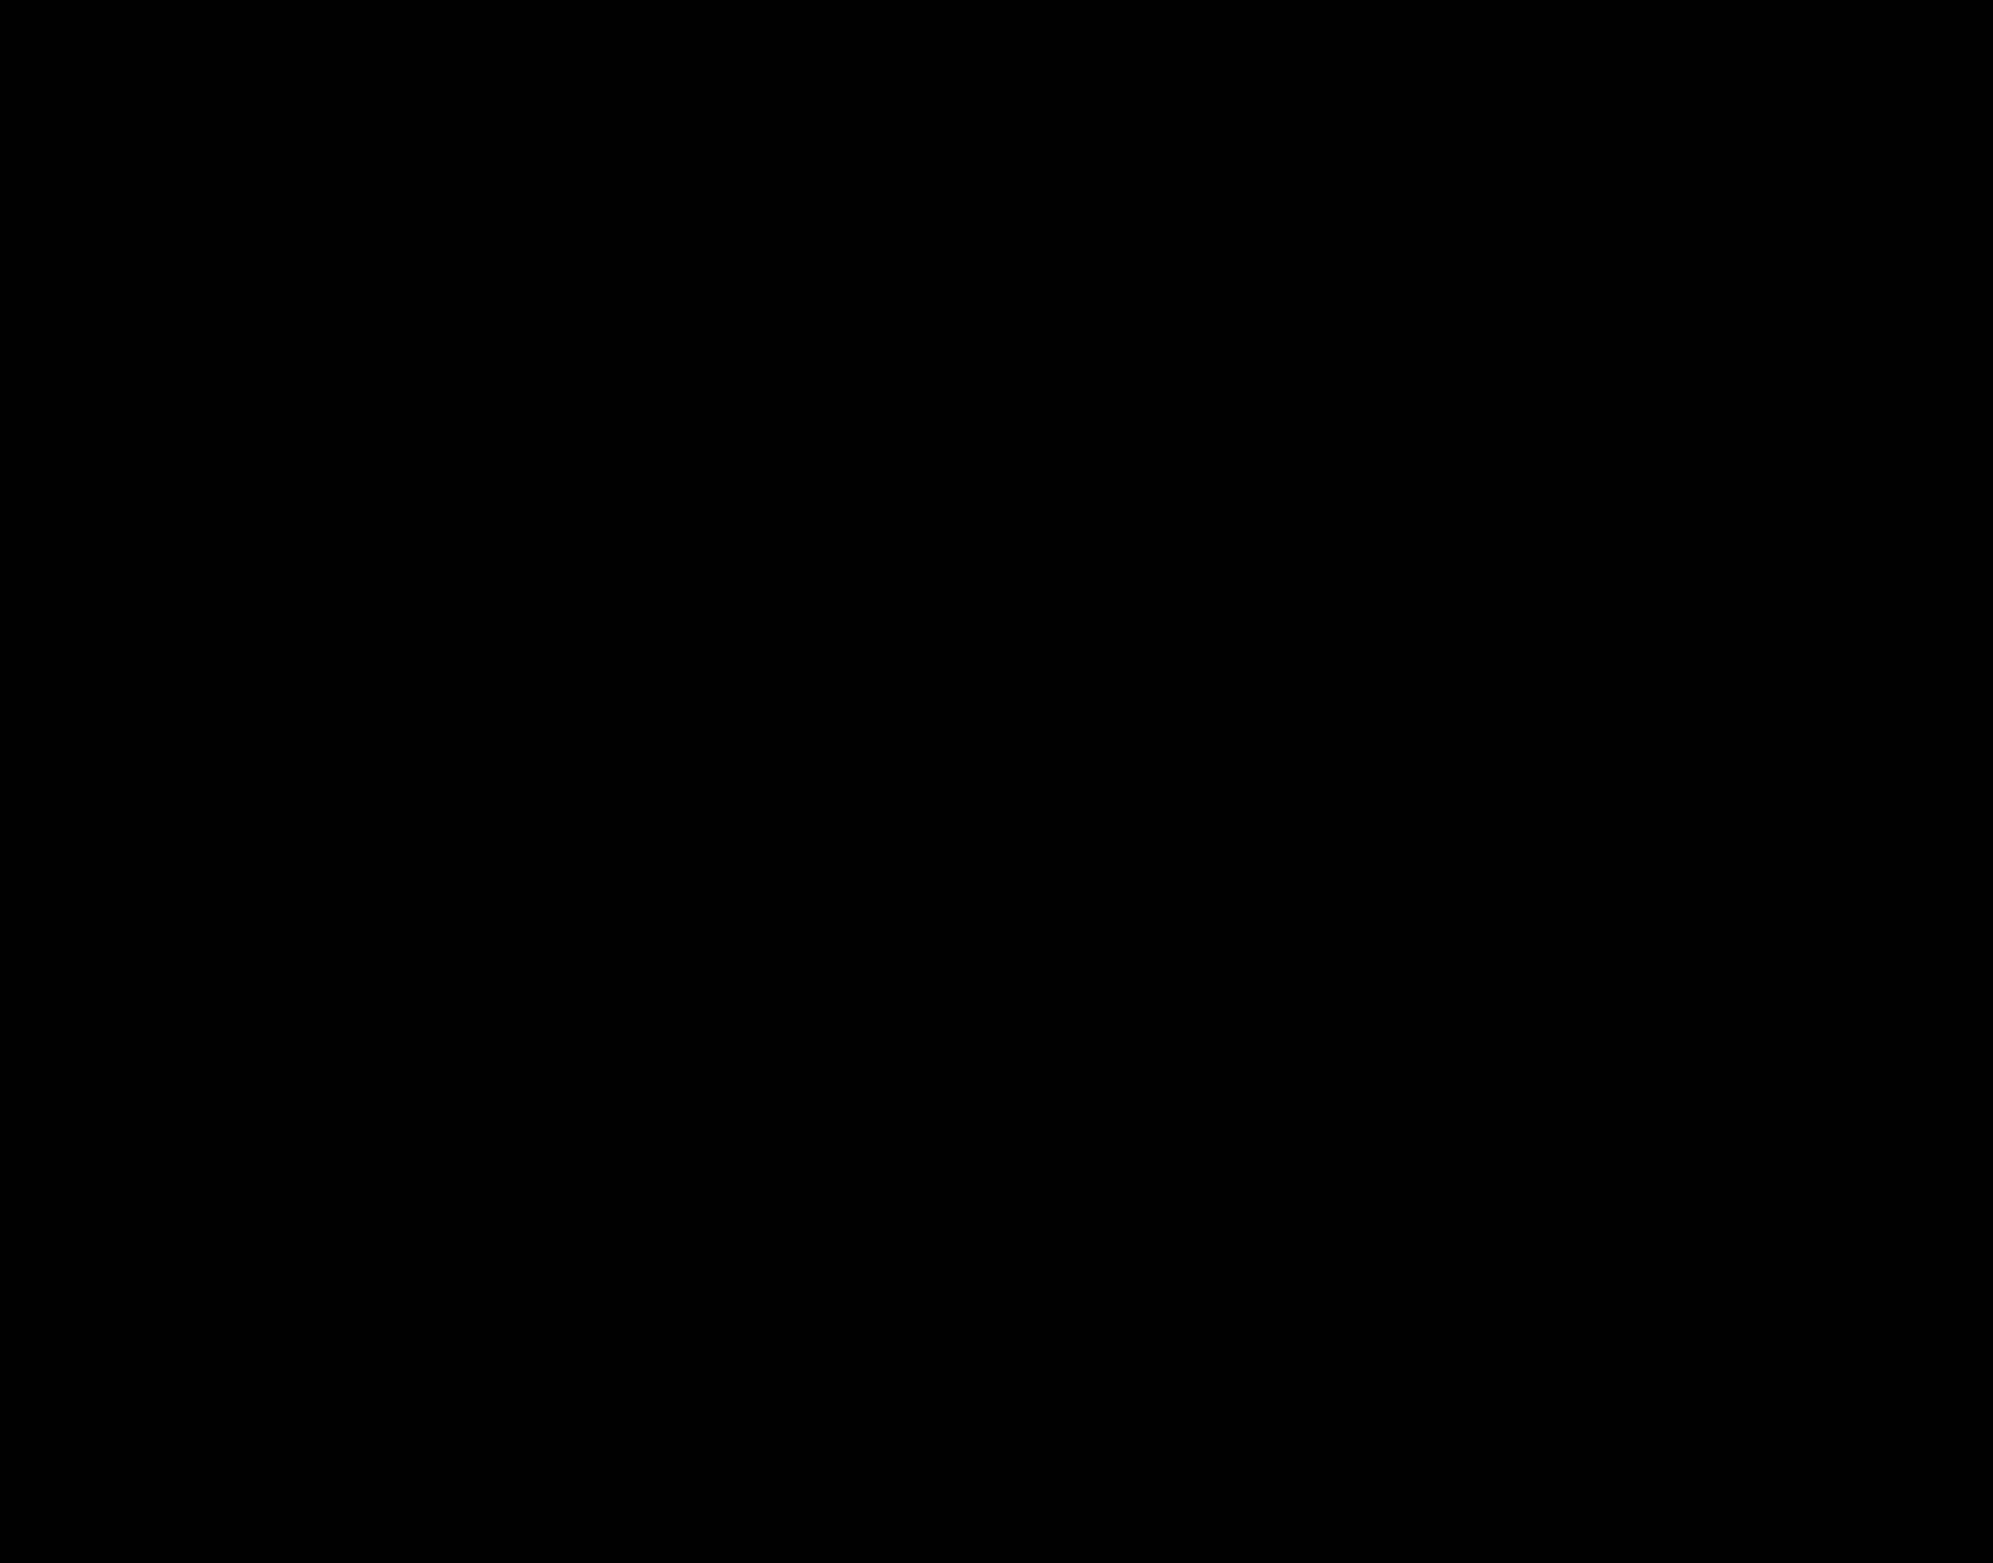 Free ukiyo-e illustration of Frolic man